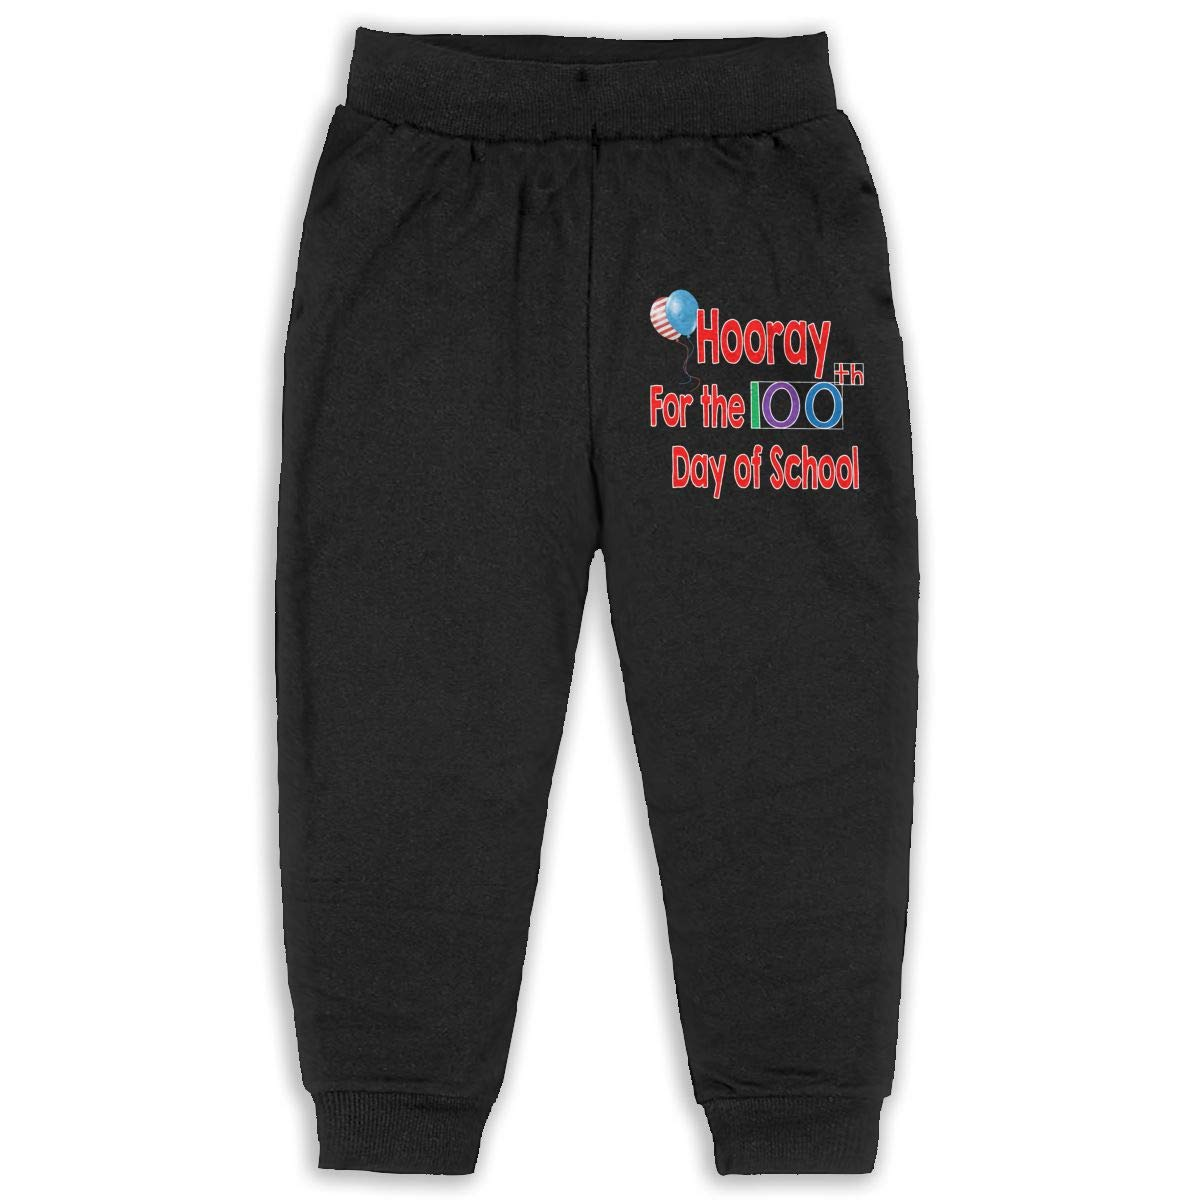 POOPEDD Happy 100th Day of School Boys Sweatpants Boys Jogger Pant 2-6years Black